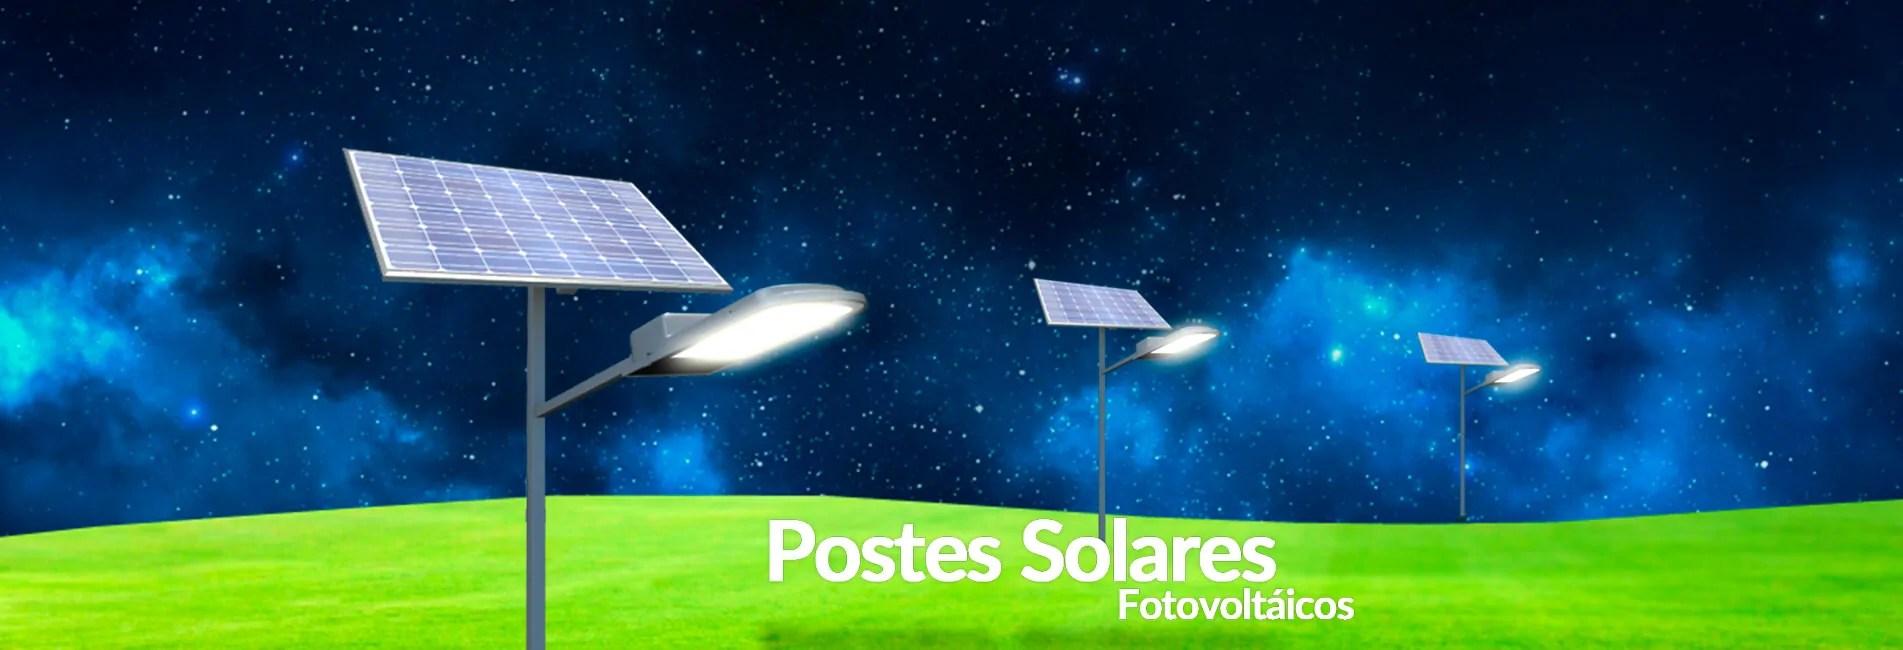 L mparas solares postes solares l mparas led - Lamparas led solares ...